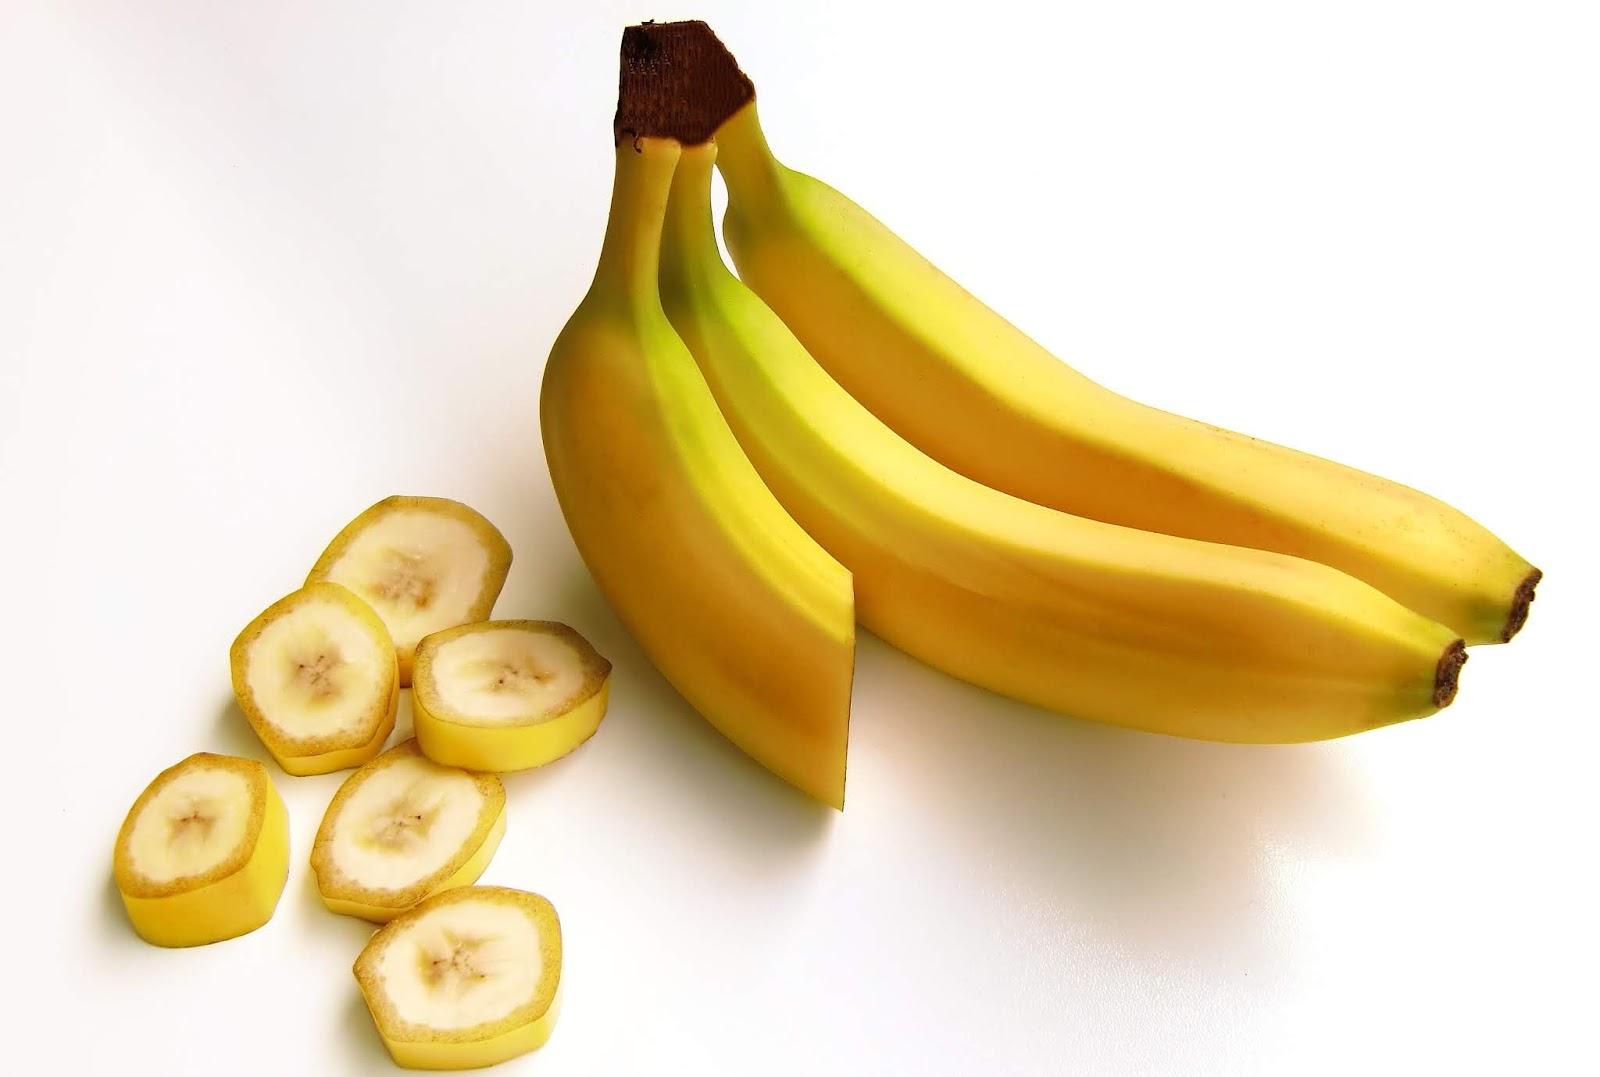 16 केले के आश्चर्यजनक लाभ | 16 Surprising Benefits Of Banana in Hindi